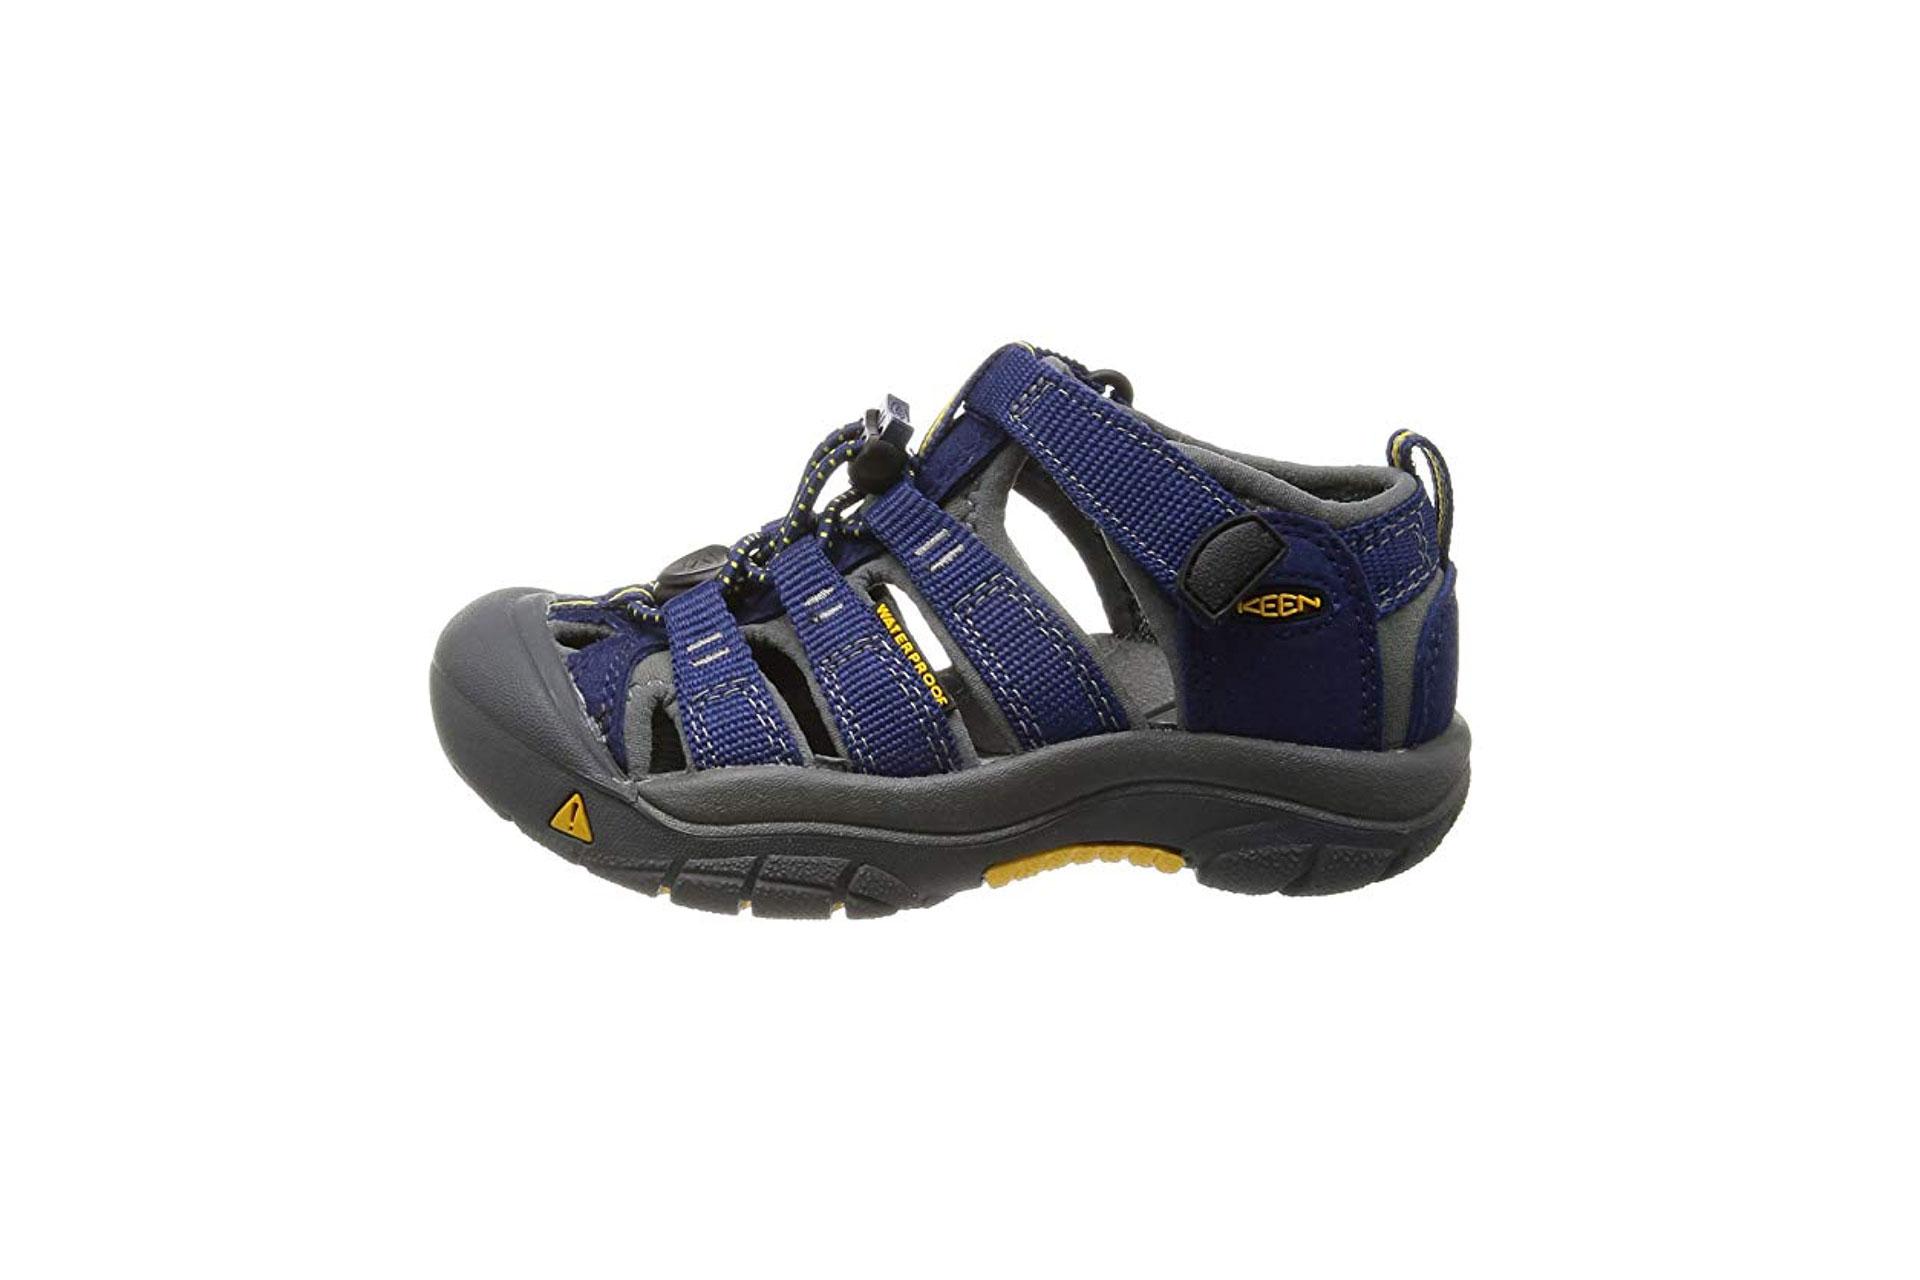 KEEN Newport Sandals; Courtesy of Amazon